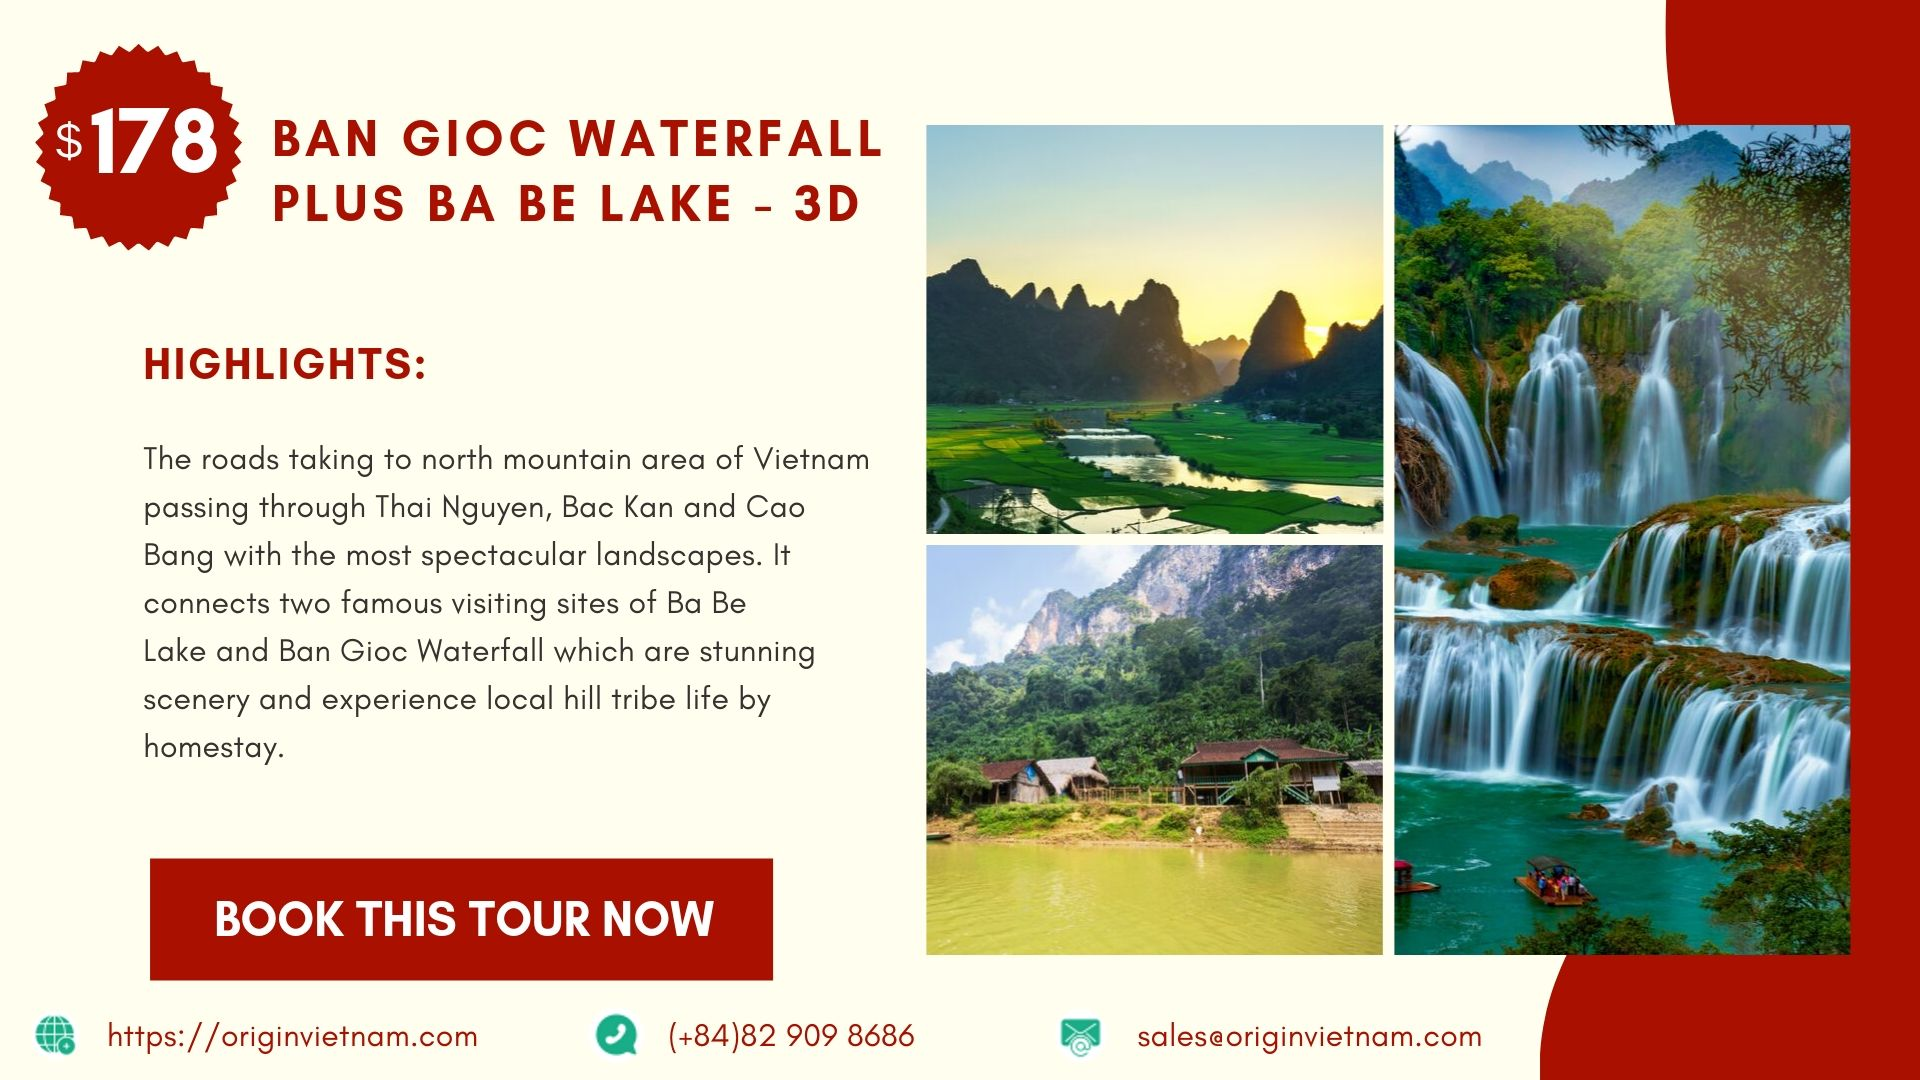 Ban Gioc waterfall plus Ba Be Lake trip from Hanoi